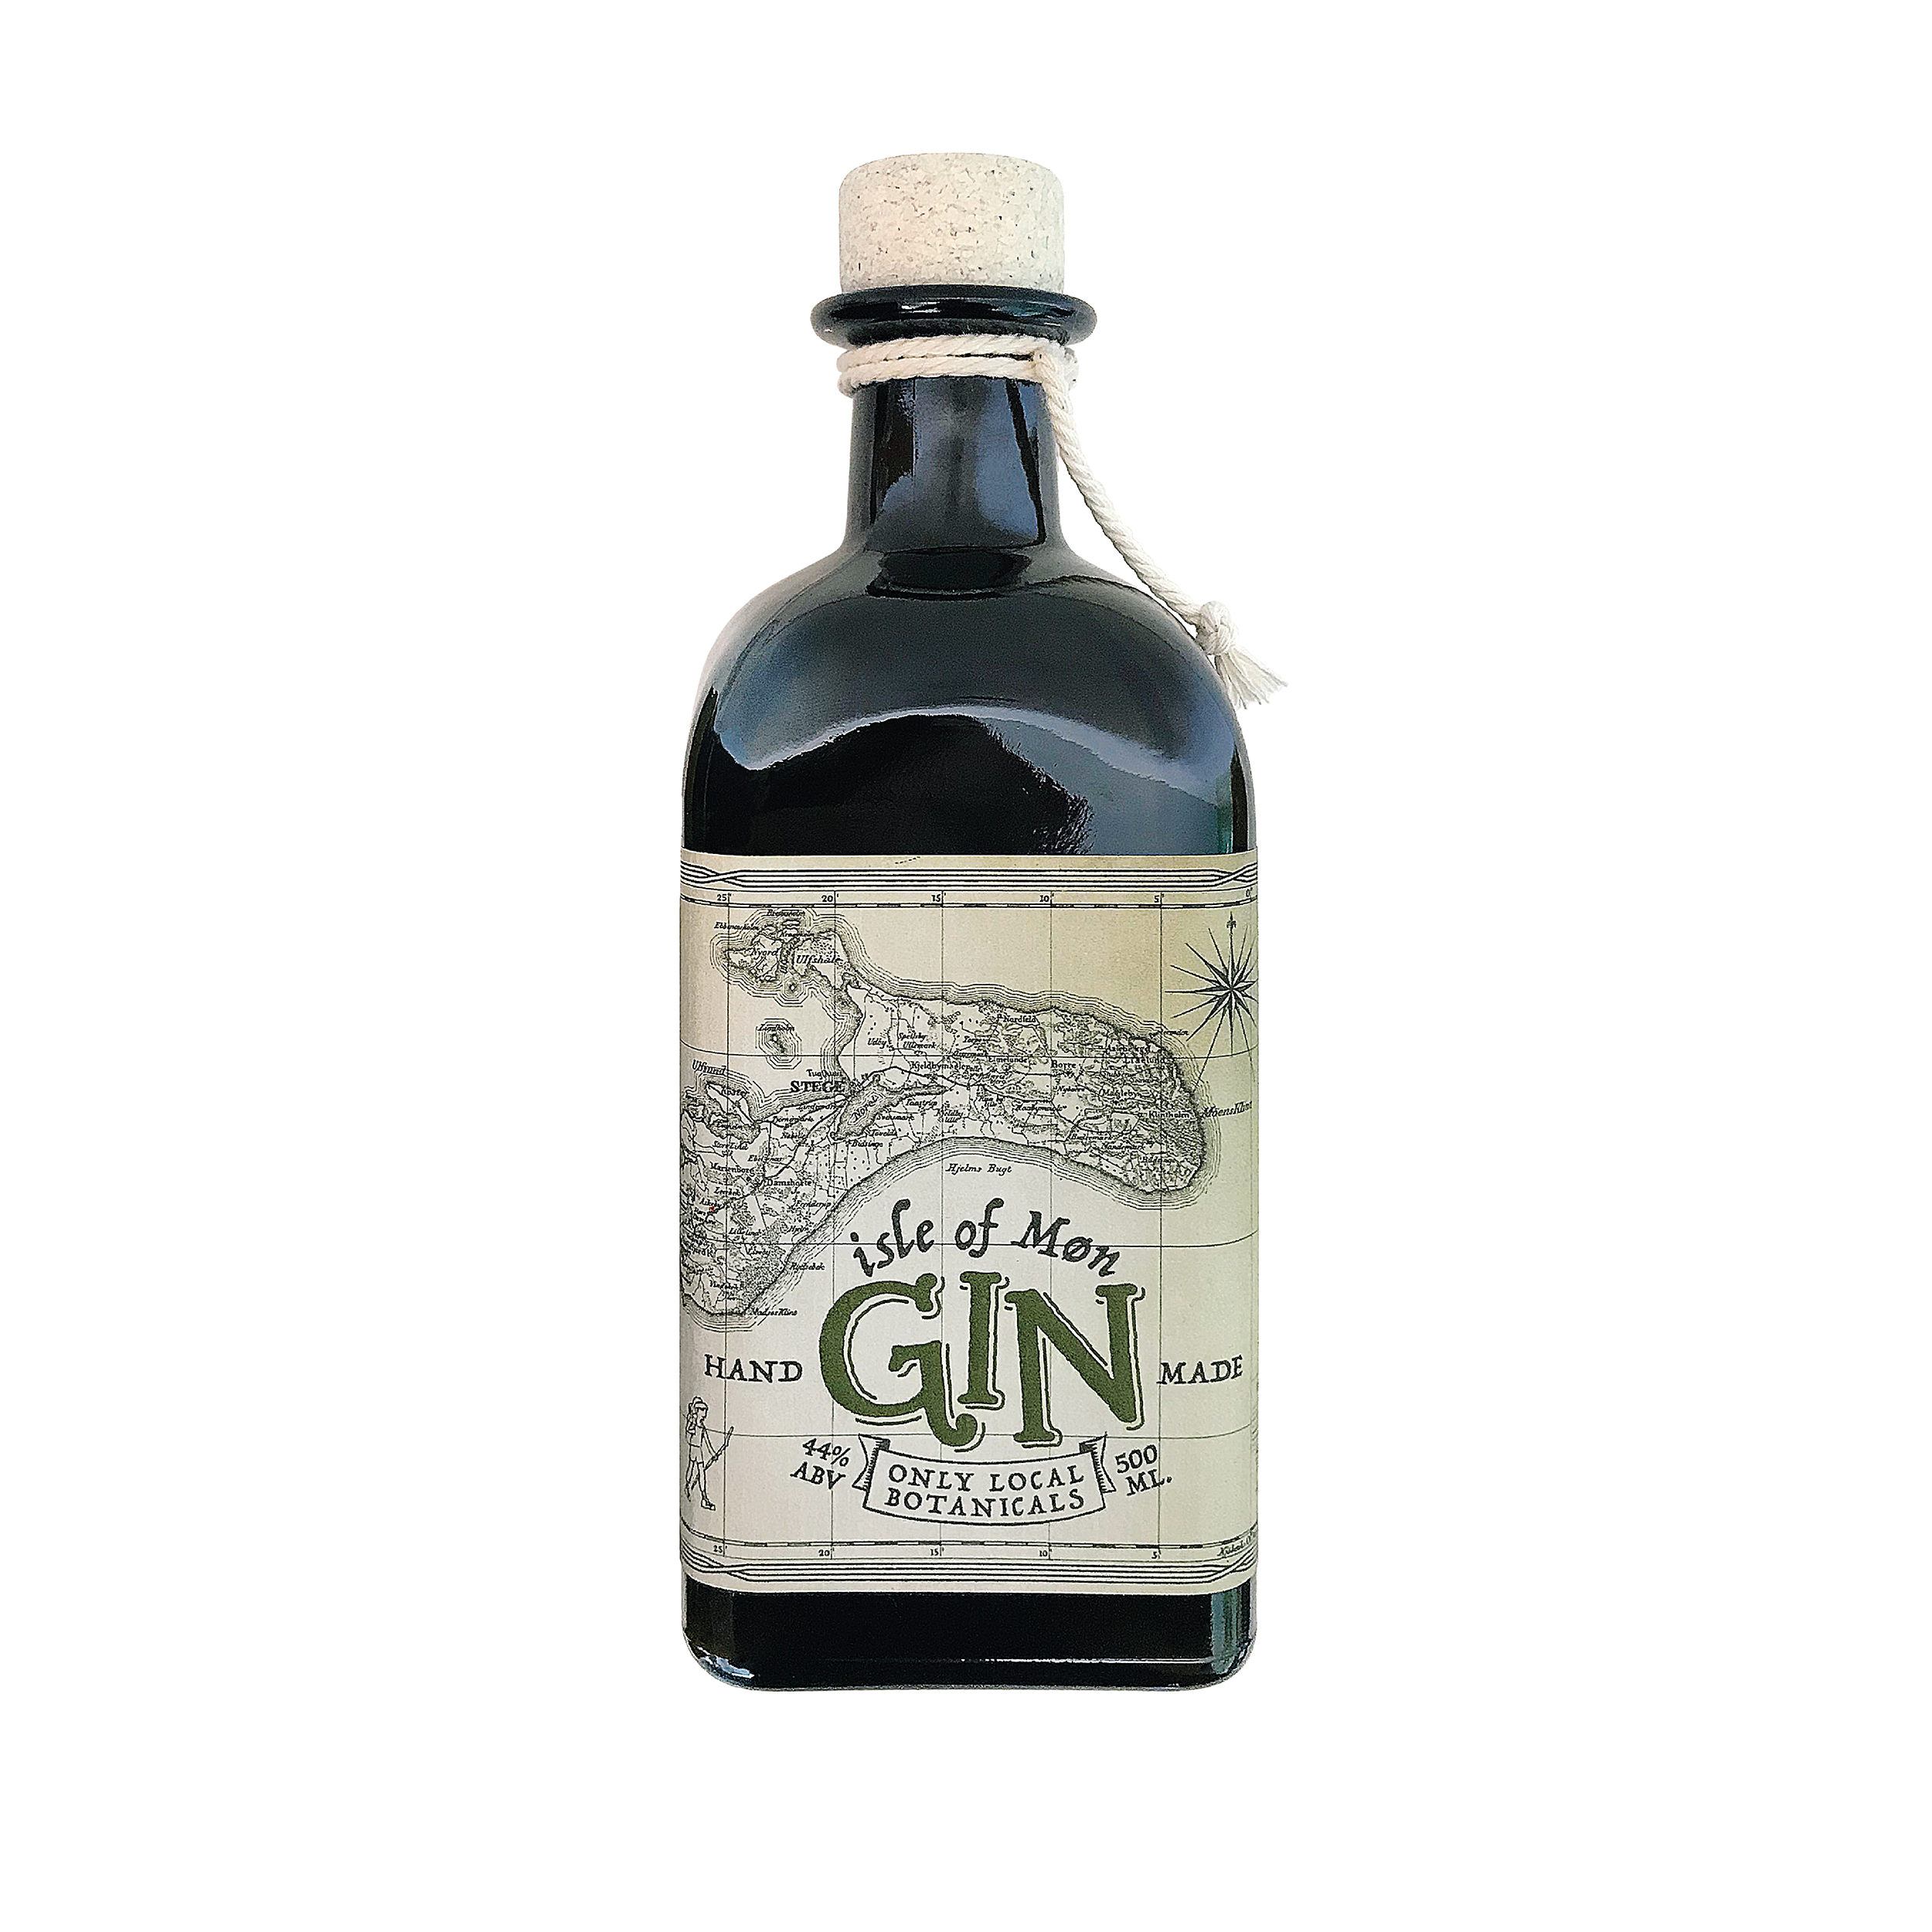 Productshots_Gin-04.png